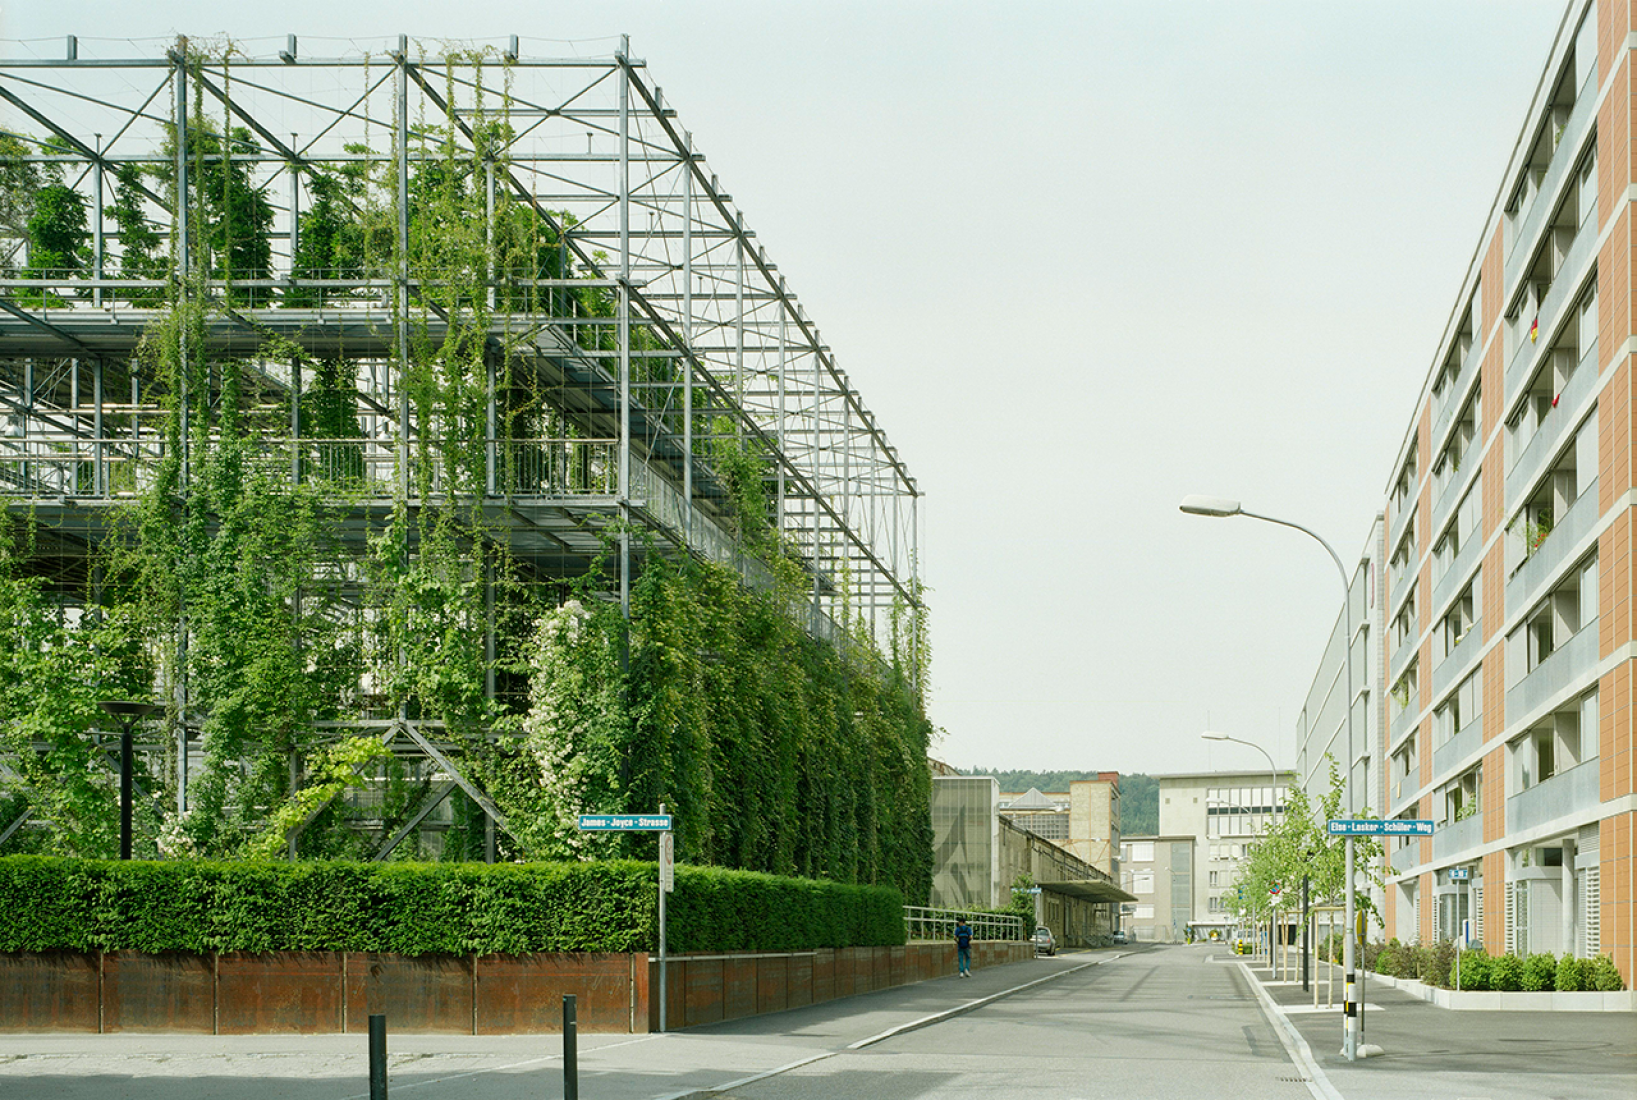 Parque MFO en Zúrich. Por Burckhardt+Partner AG Zurich & Raderschallpartner AG. Fotografía © Michael Fritschi